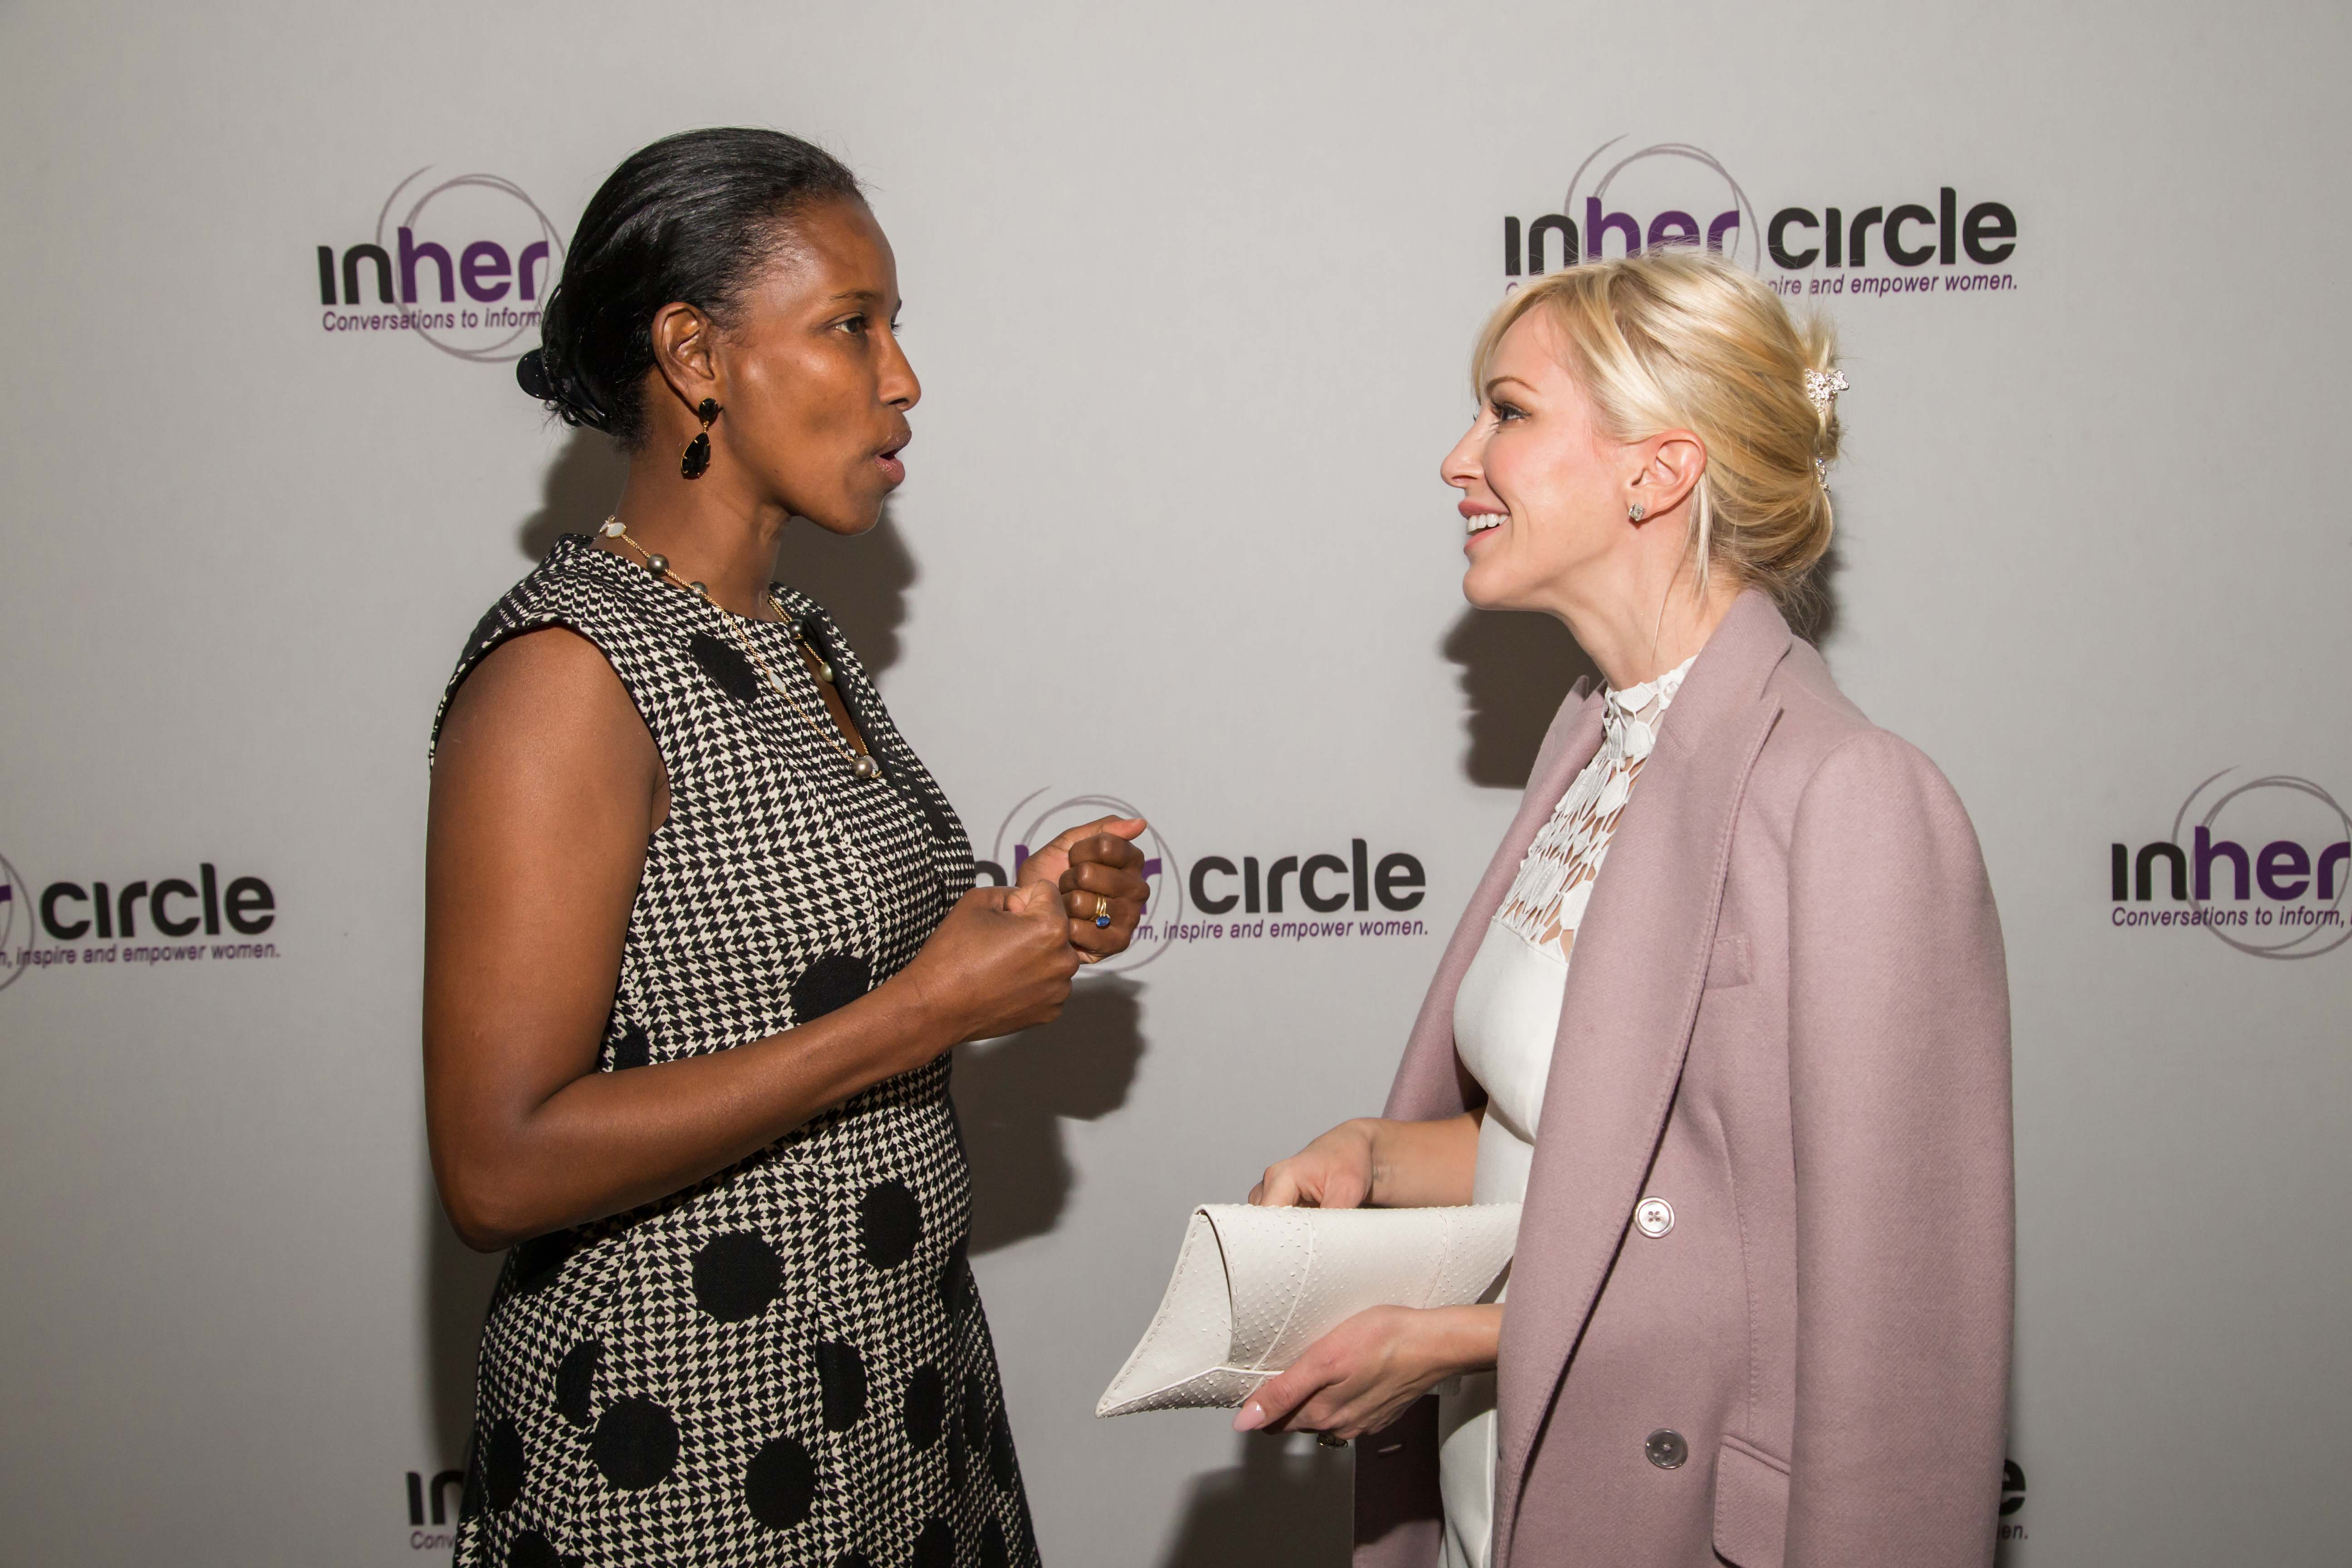 inher-circle-Beth-Friedman-Ayaan-Hirsi-Ali-salon17